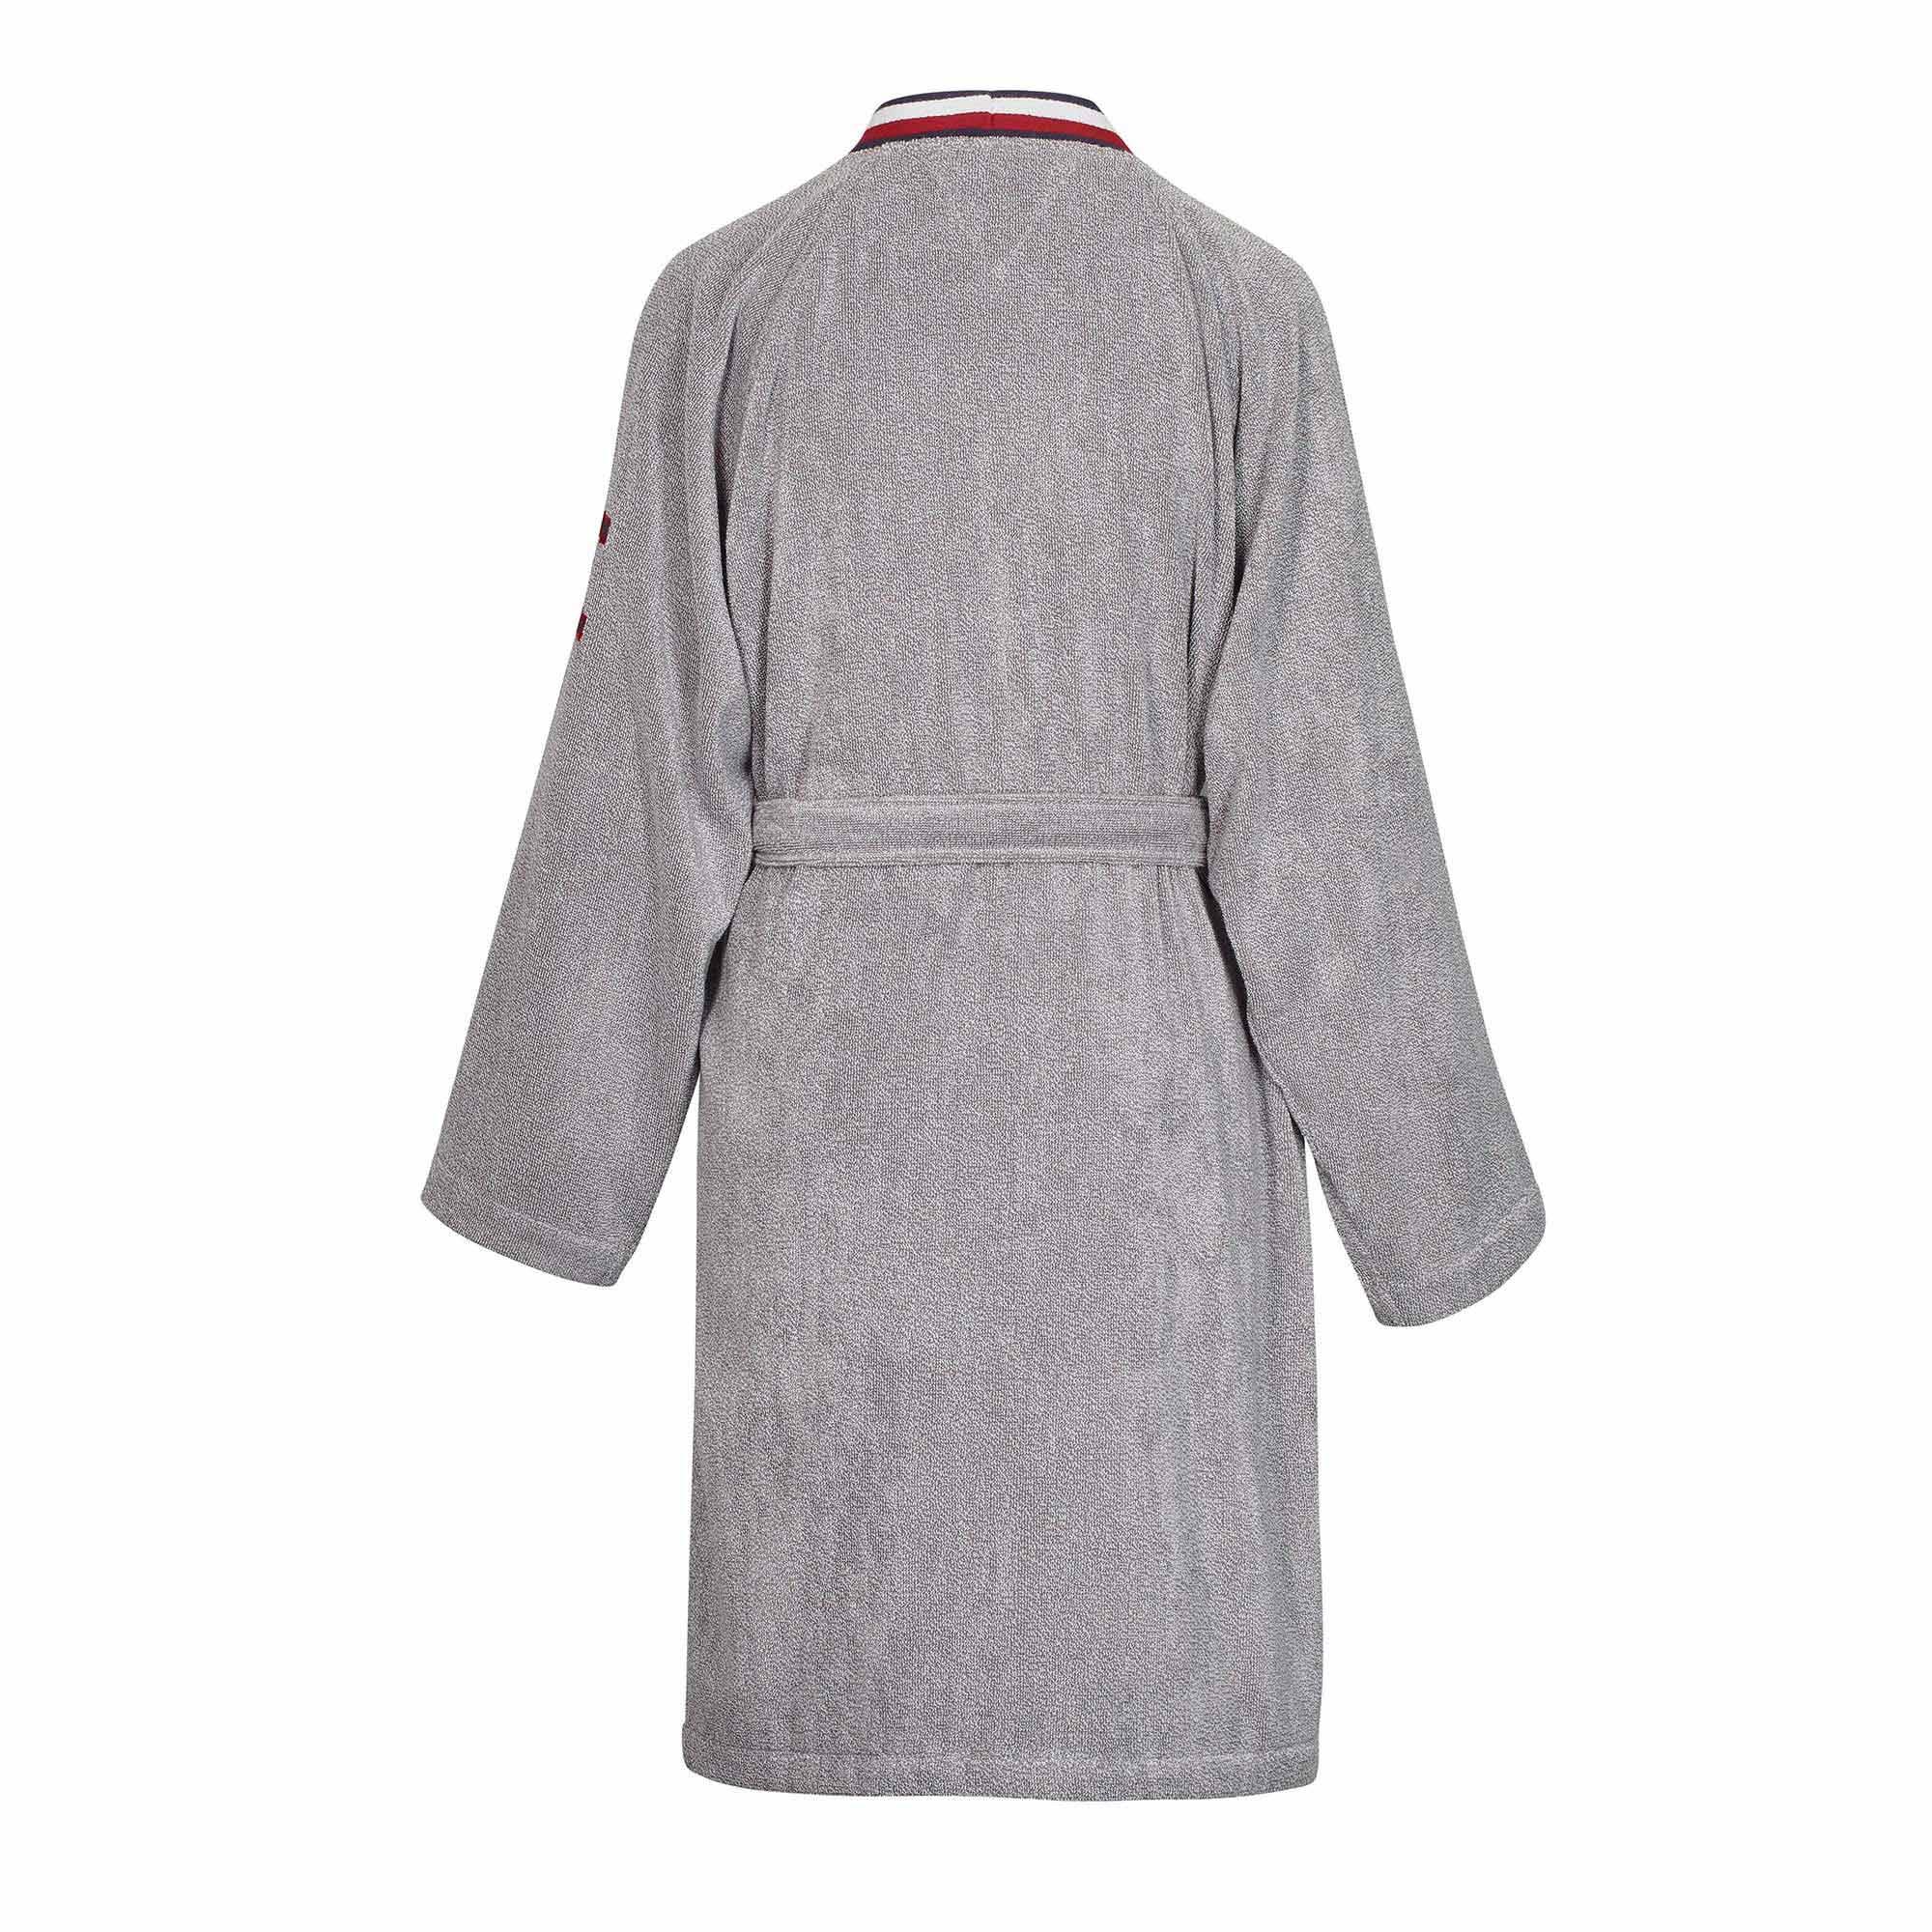 Tommy-Hilfiger-Peignoir-kimono-teddy-eponge-grey-Ghost-Dos